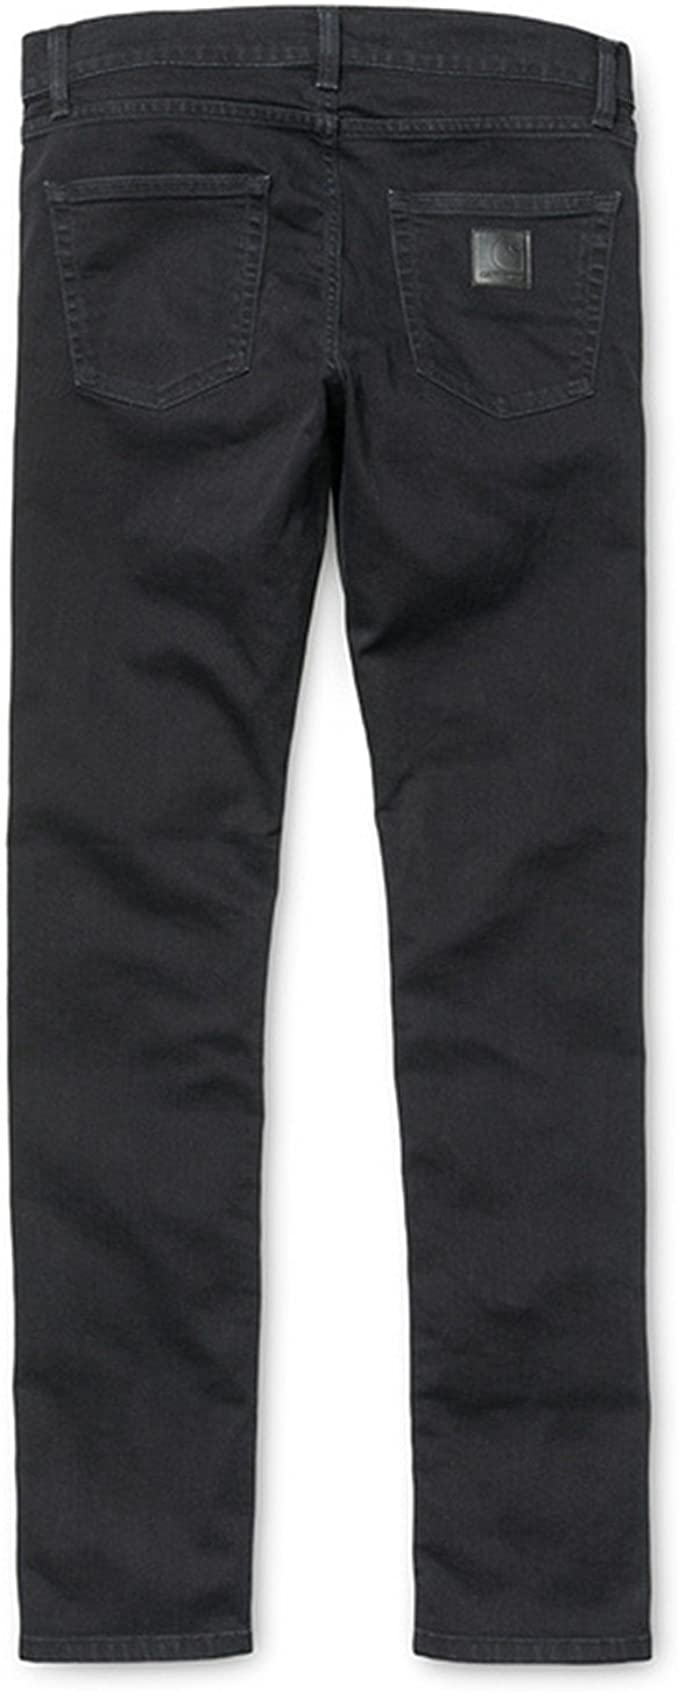 Carhartt WIP-Rebel Pant /'Towner/' Black//Black Stretch Denim.. Black Stone Wash